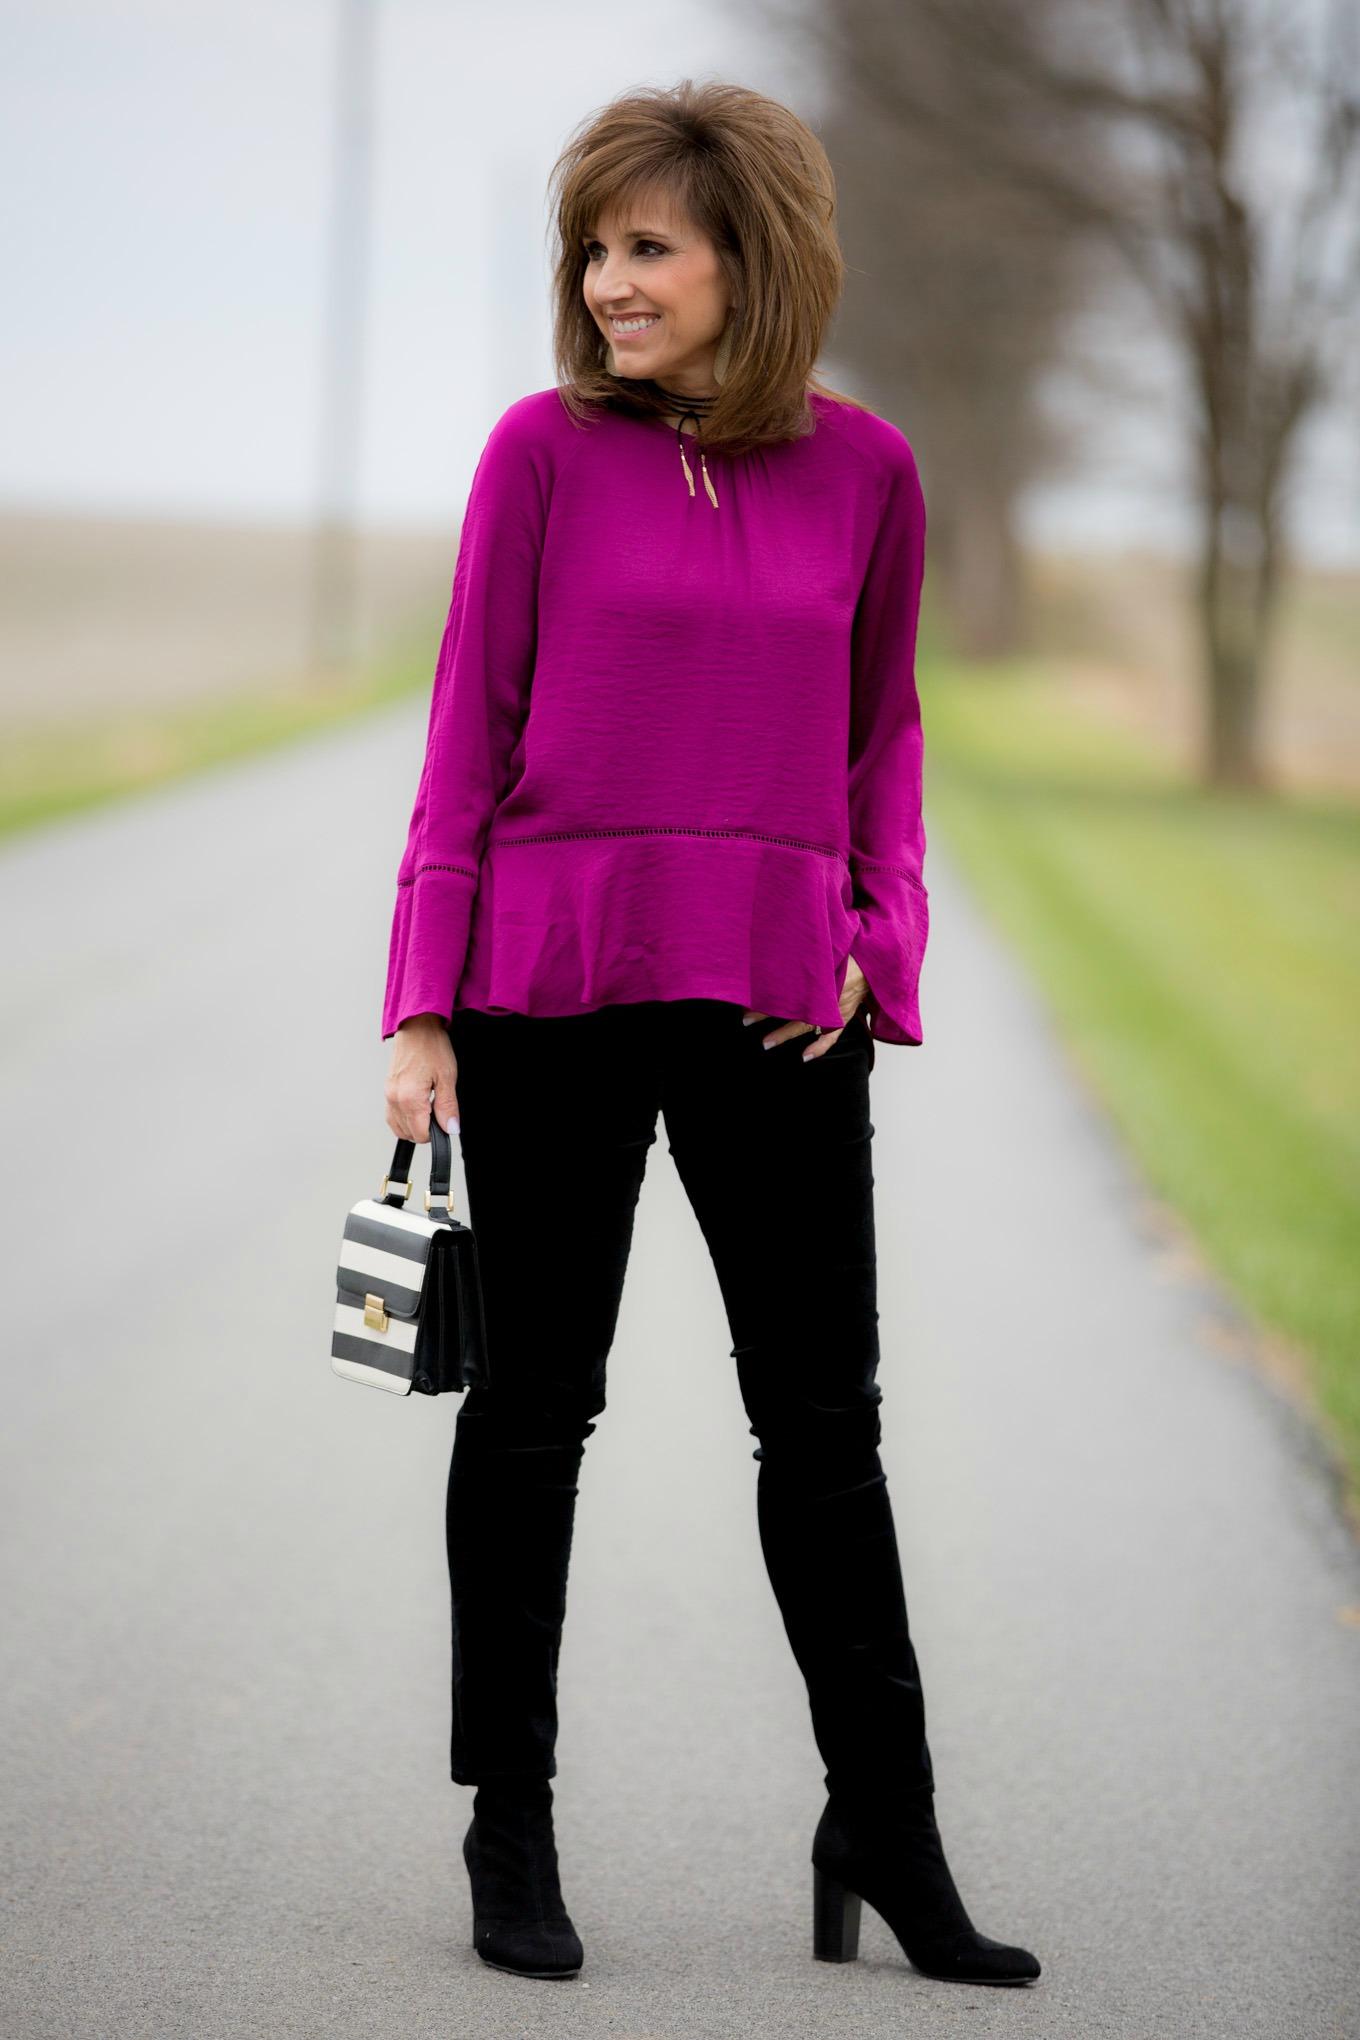 Fashion blogger, Cyndi Spivey, styling a budget friendly holiday outfit.